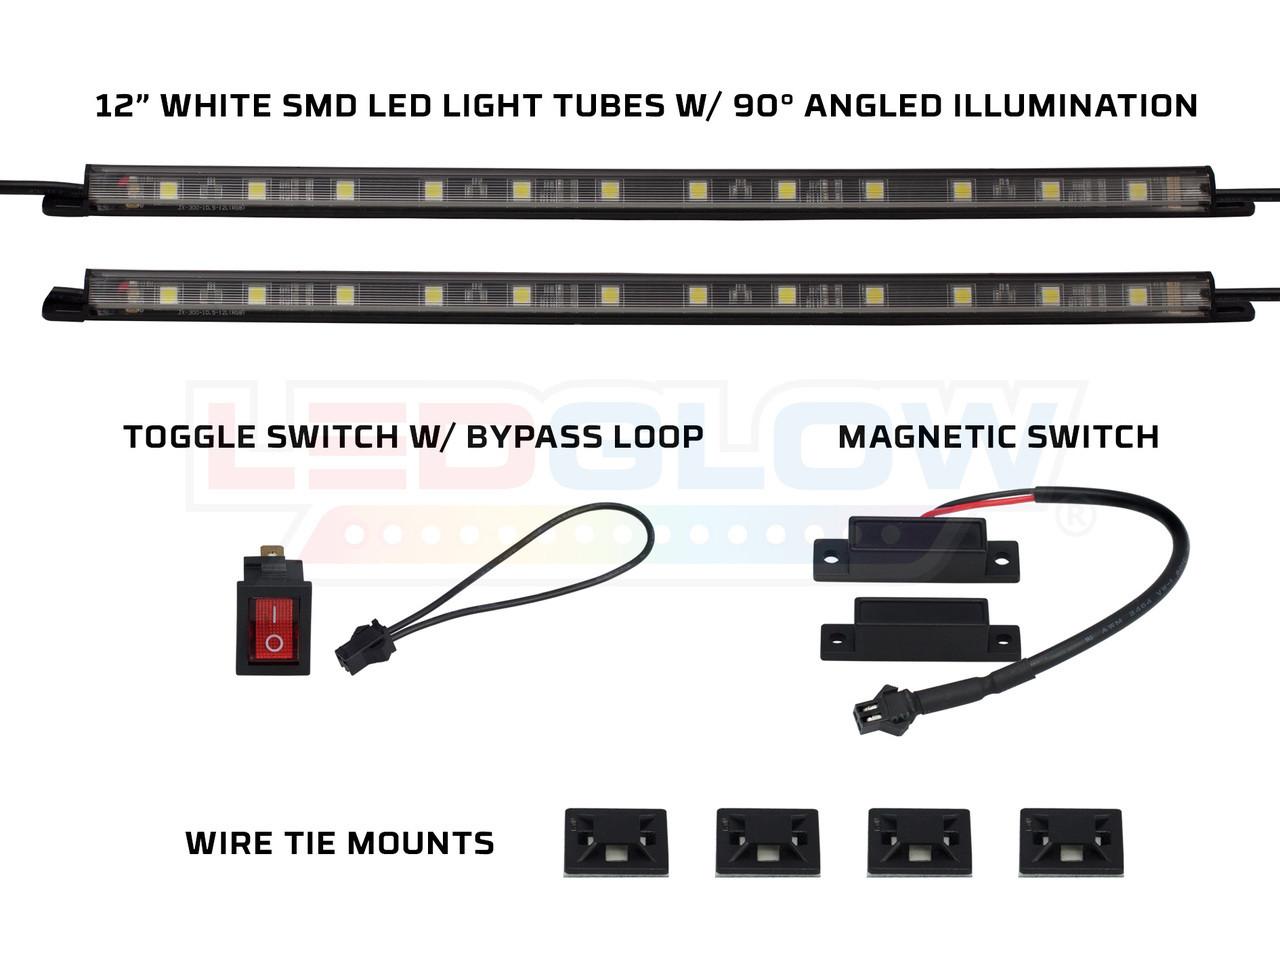 Wiring A Light In Box Truck House Diagram Symbols Pool Ledglow 2pc Tool Led Lights Rh Ledunderbody Com 3 Way Switch